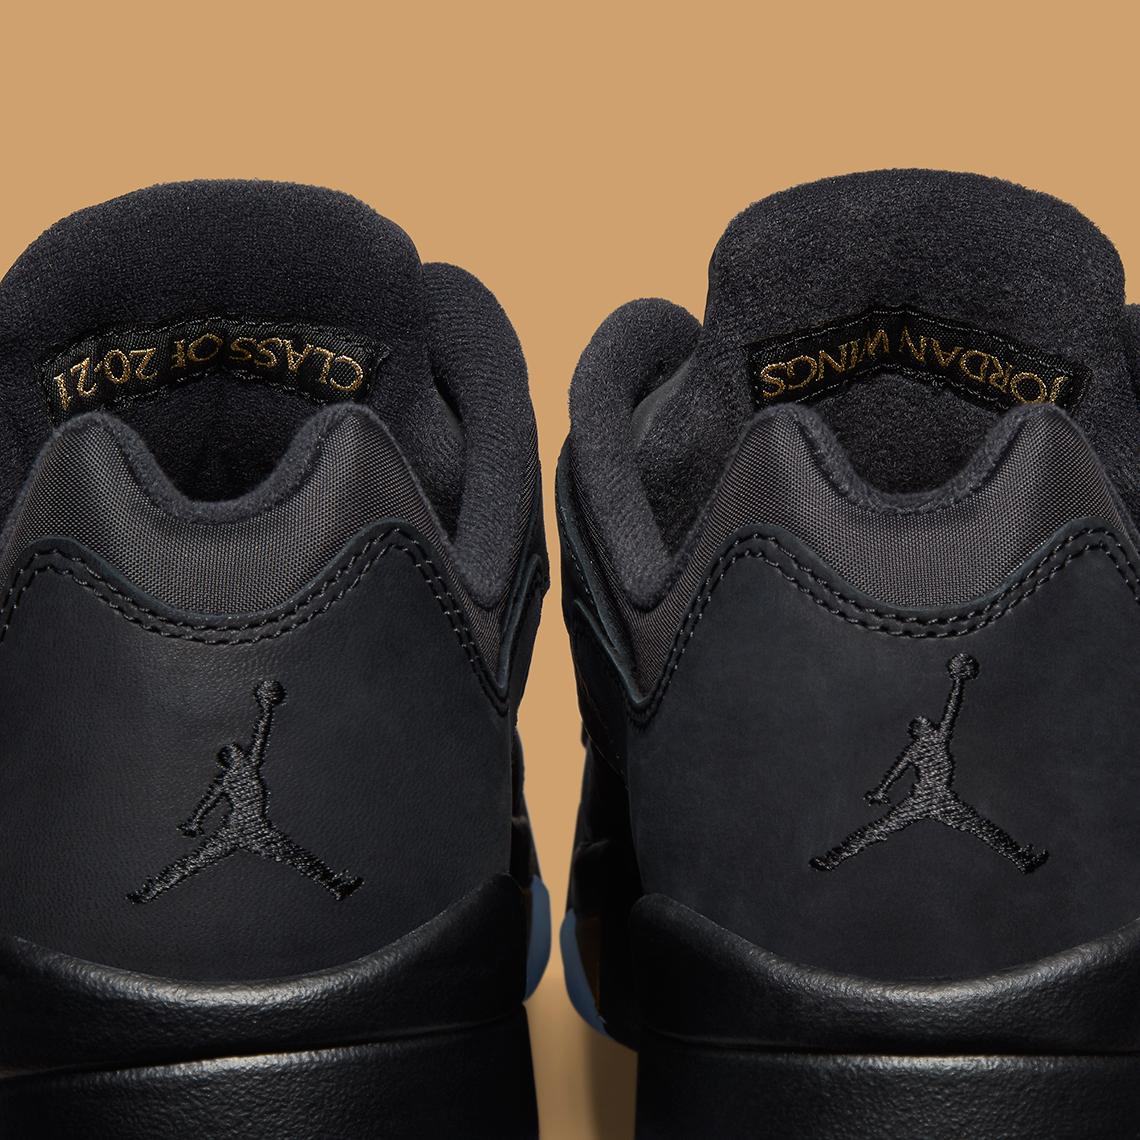 Air Jordan 5 Low WINGS Class of 2020-2021